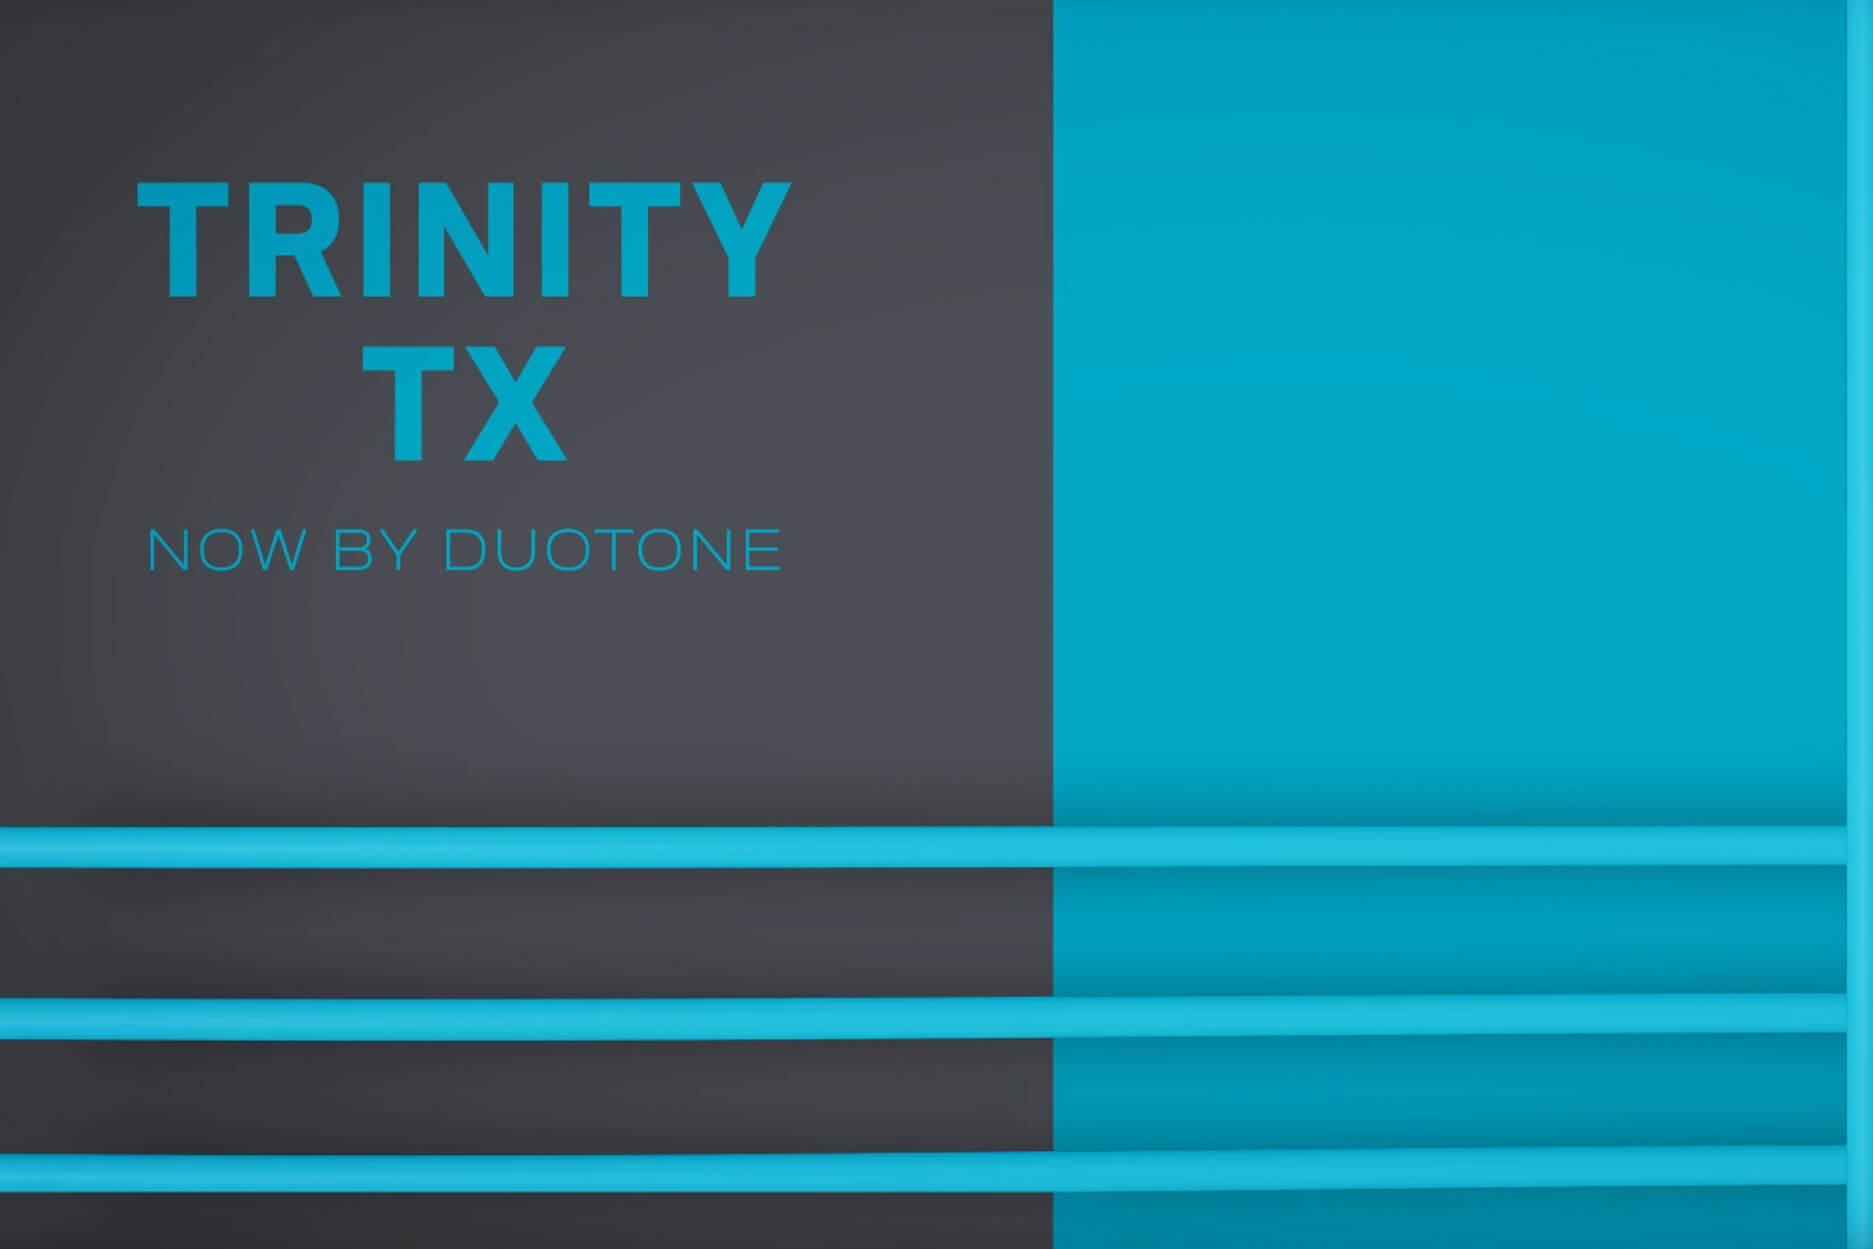 Trinity TX